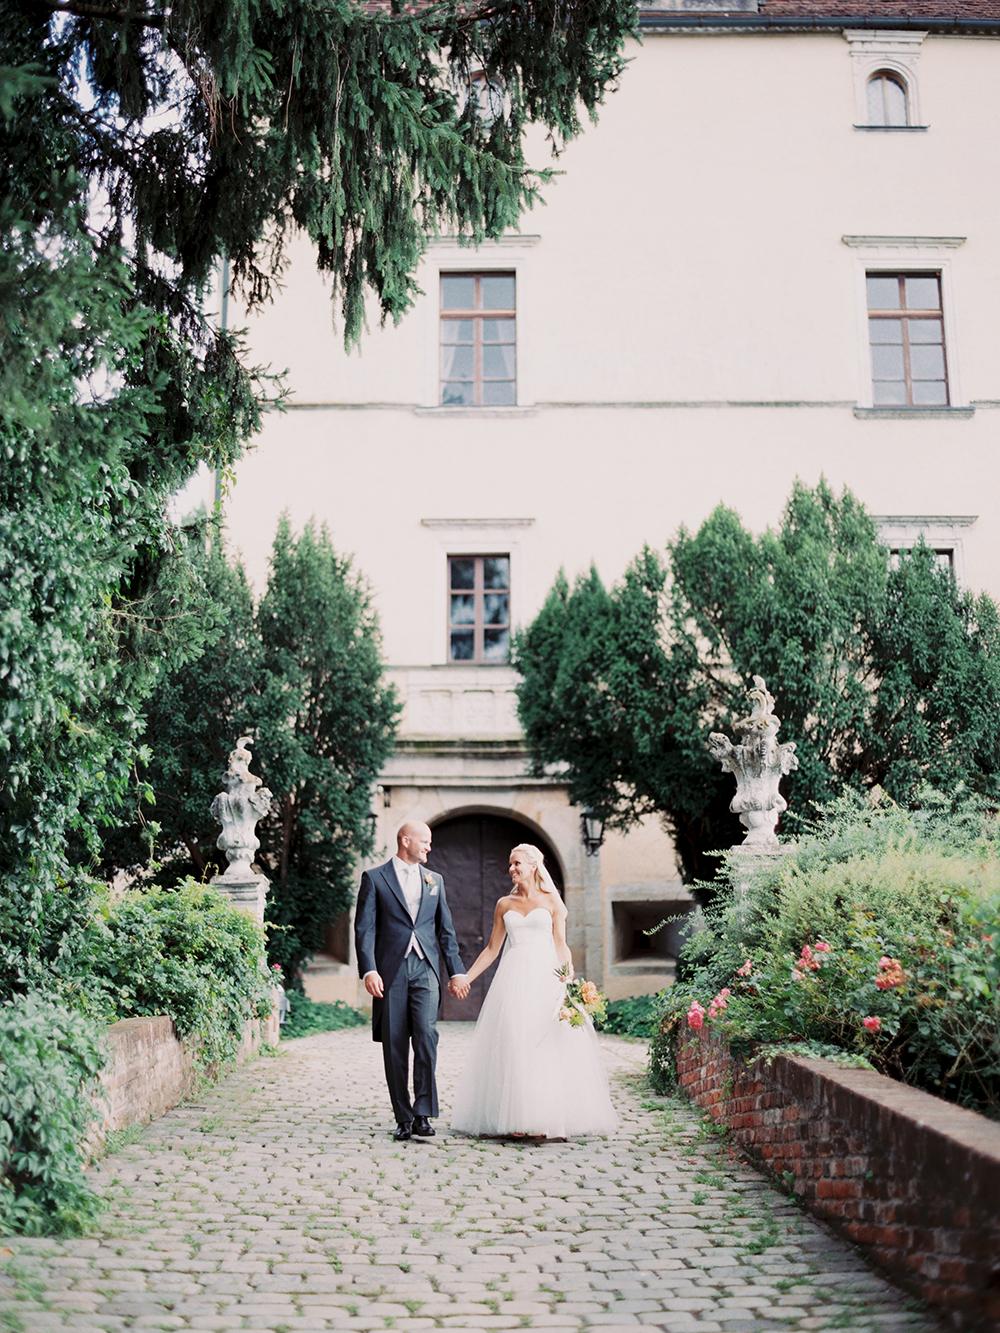 Summer Love in Austria: The Wedding Day - photo by Warm Photo http://ruffledblog.com/summer-love-wedding-in-austria